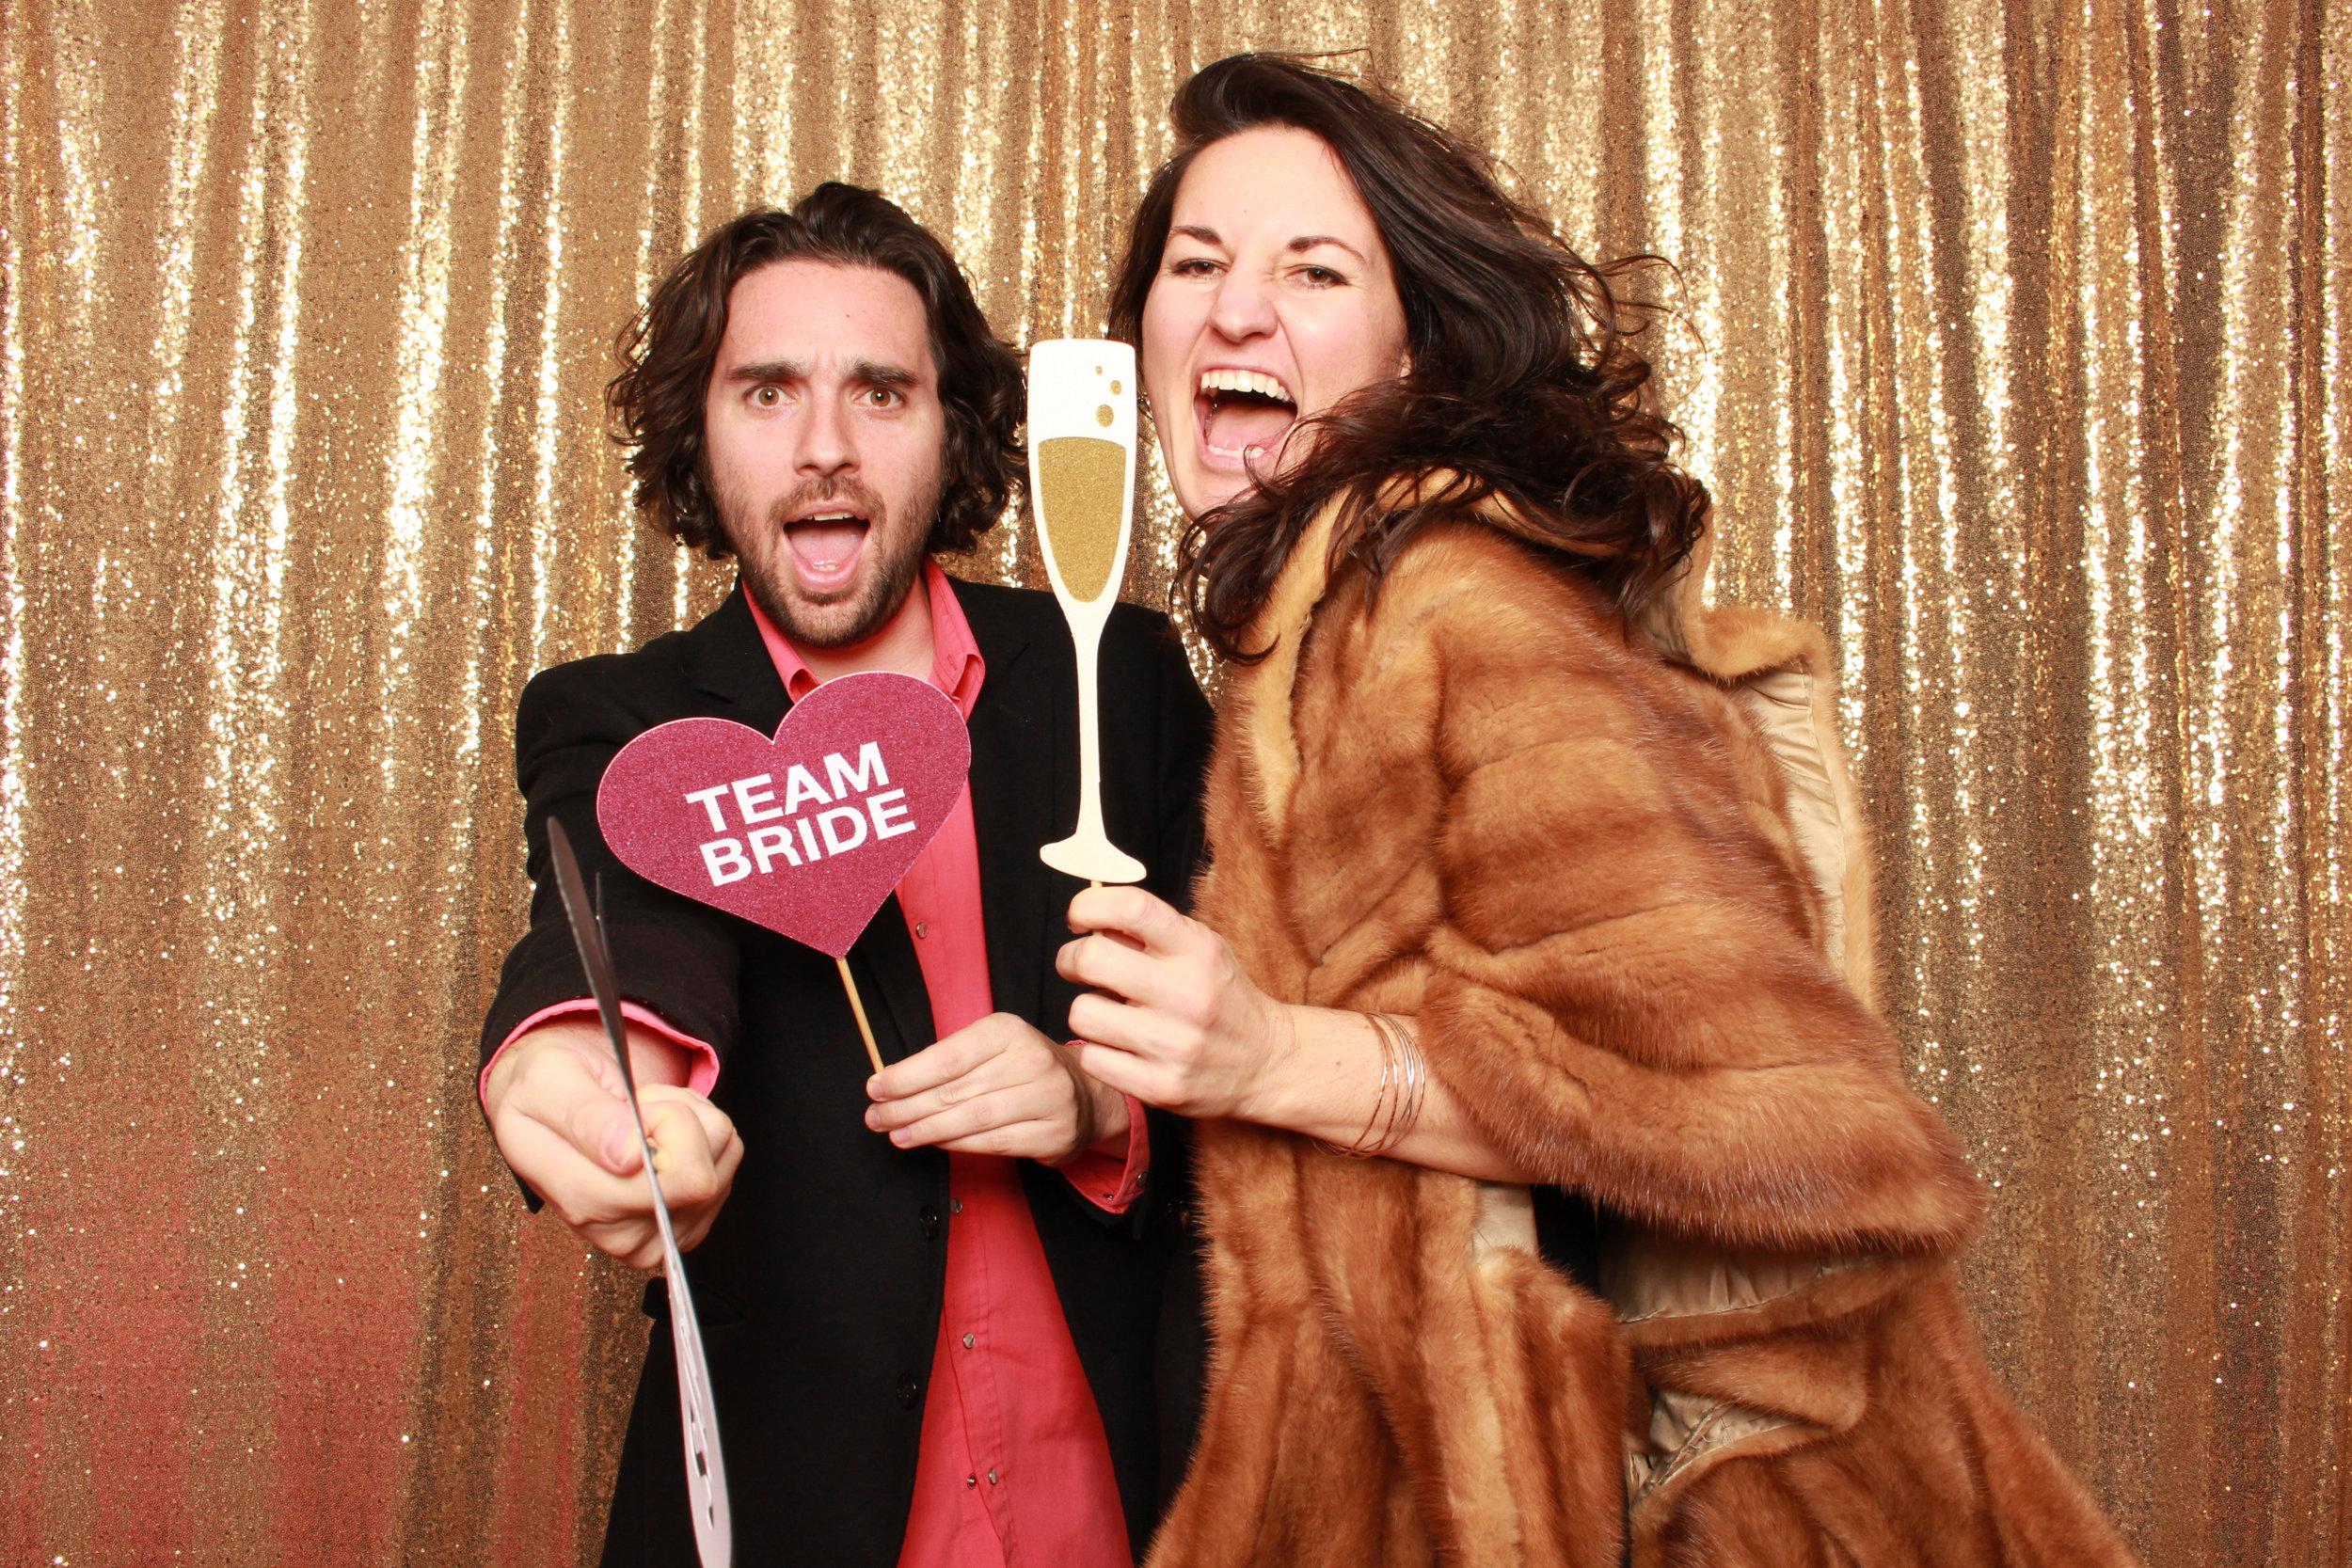 Mona & Adam | Classy Camp Lucy Wedding Photo Booth Rental — Oh Happy